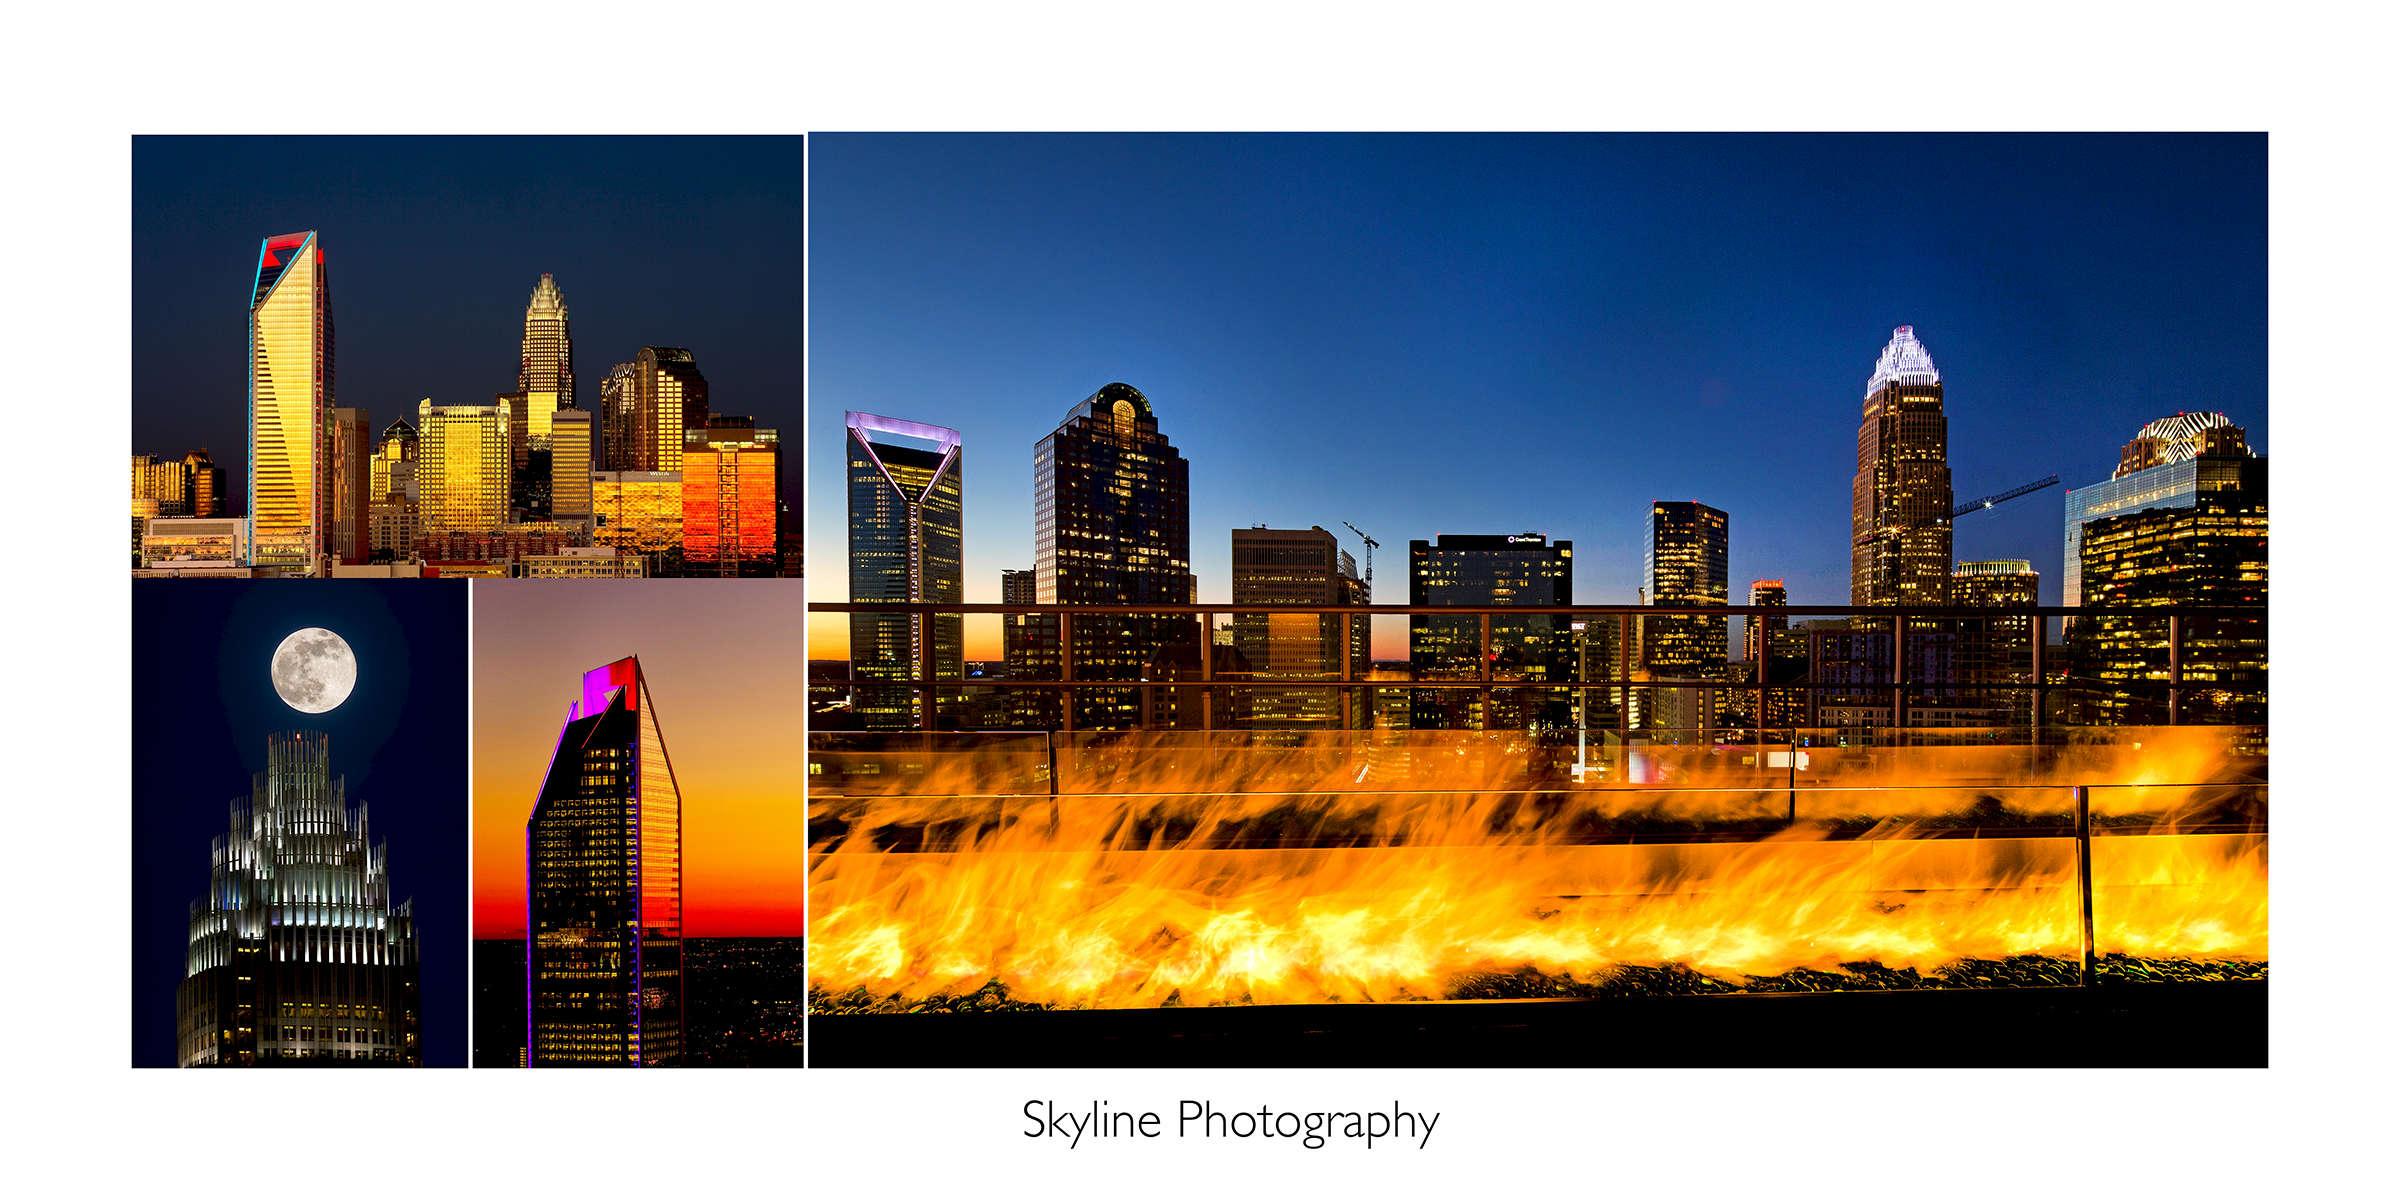 Skyline_Photography_068s